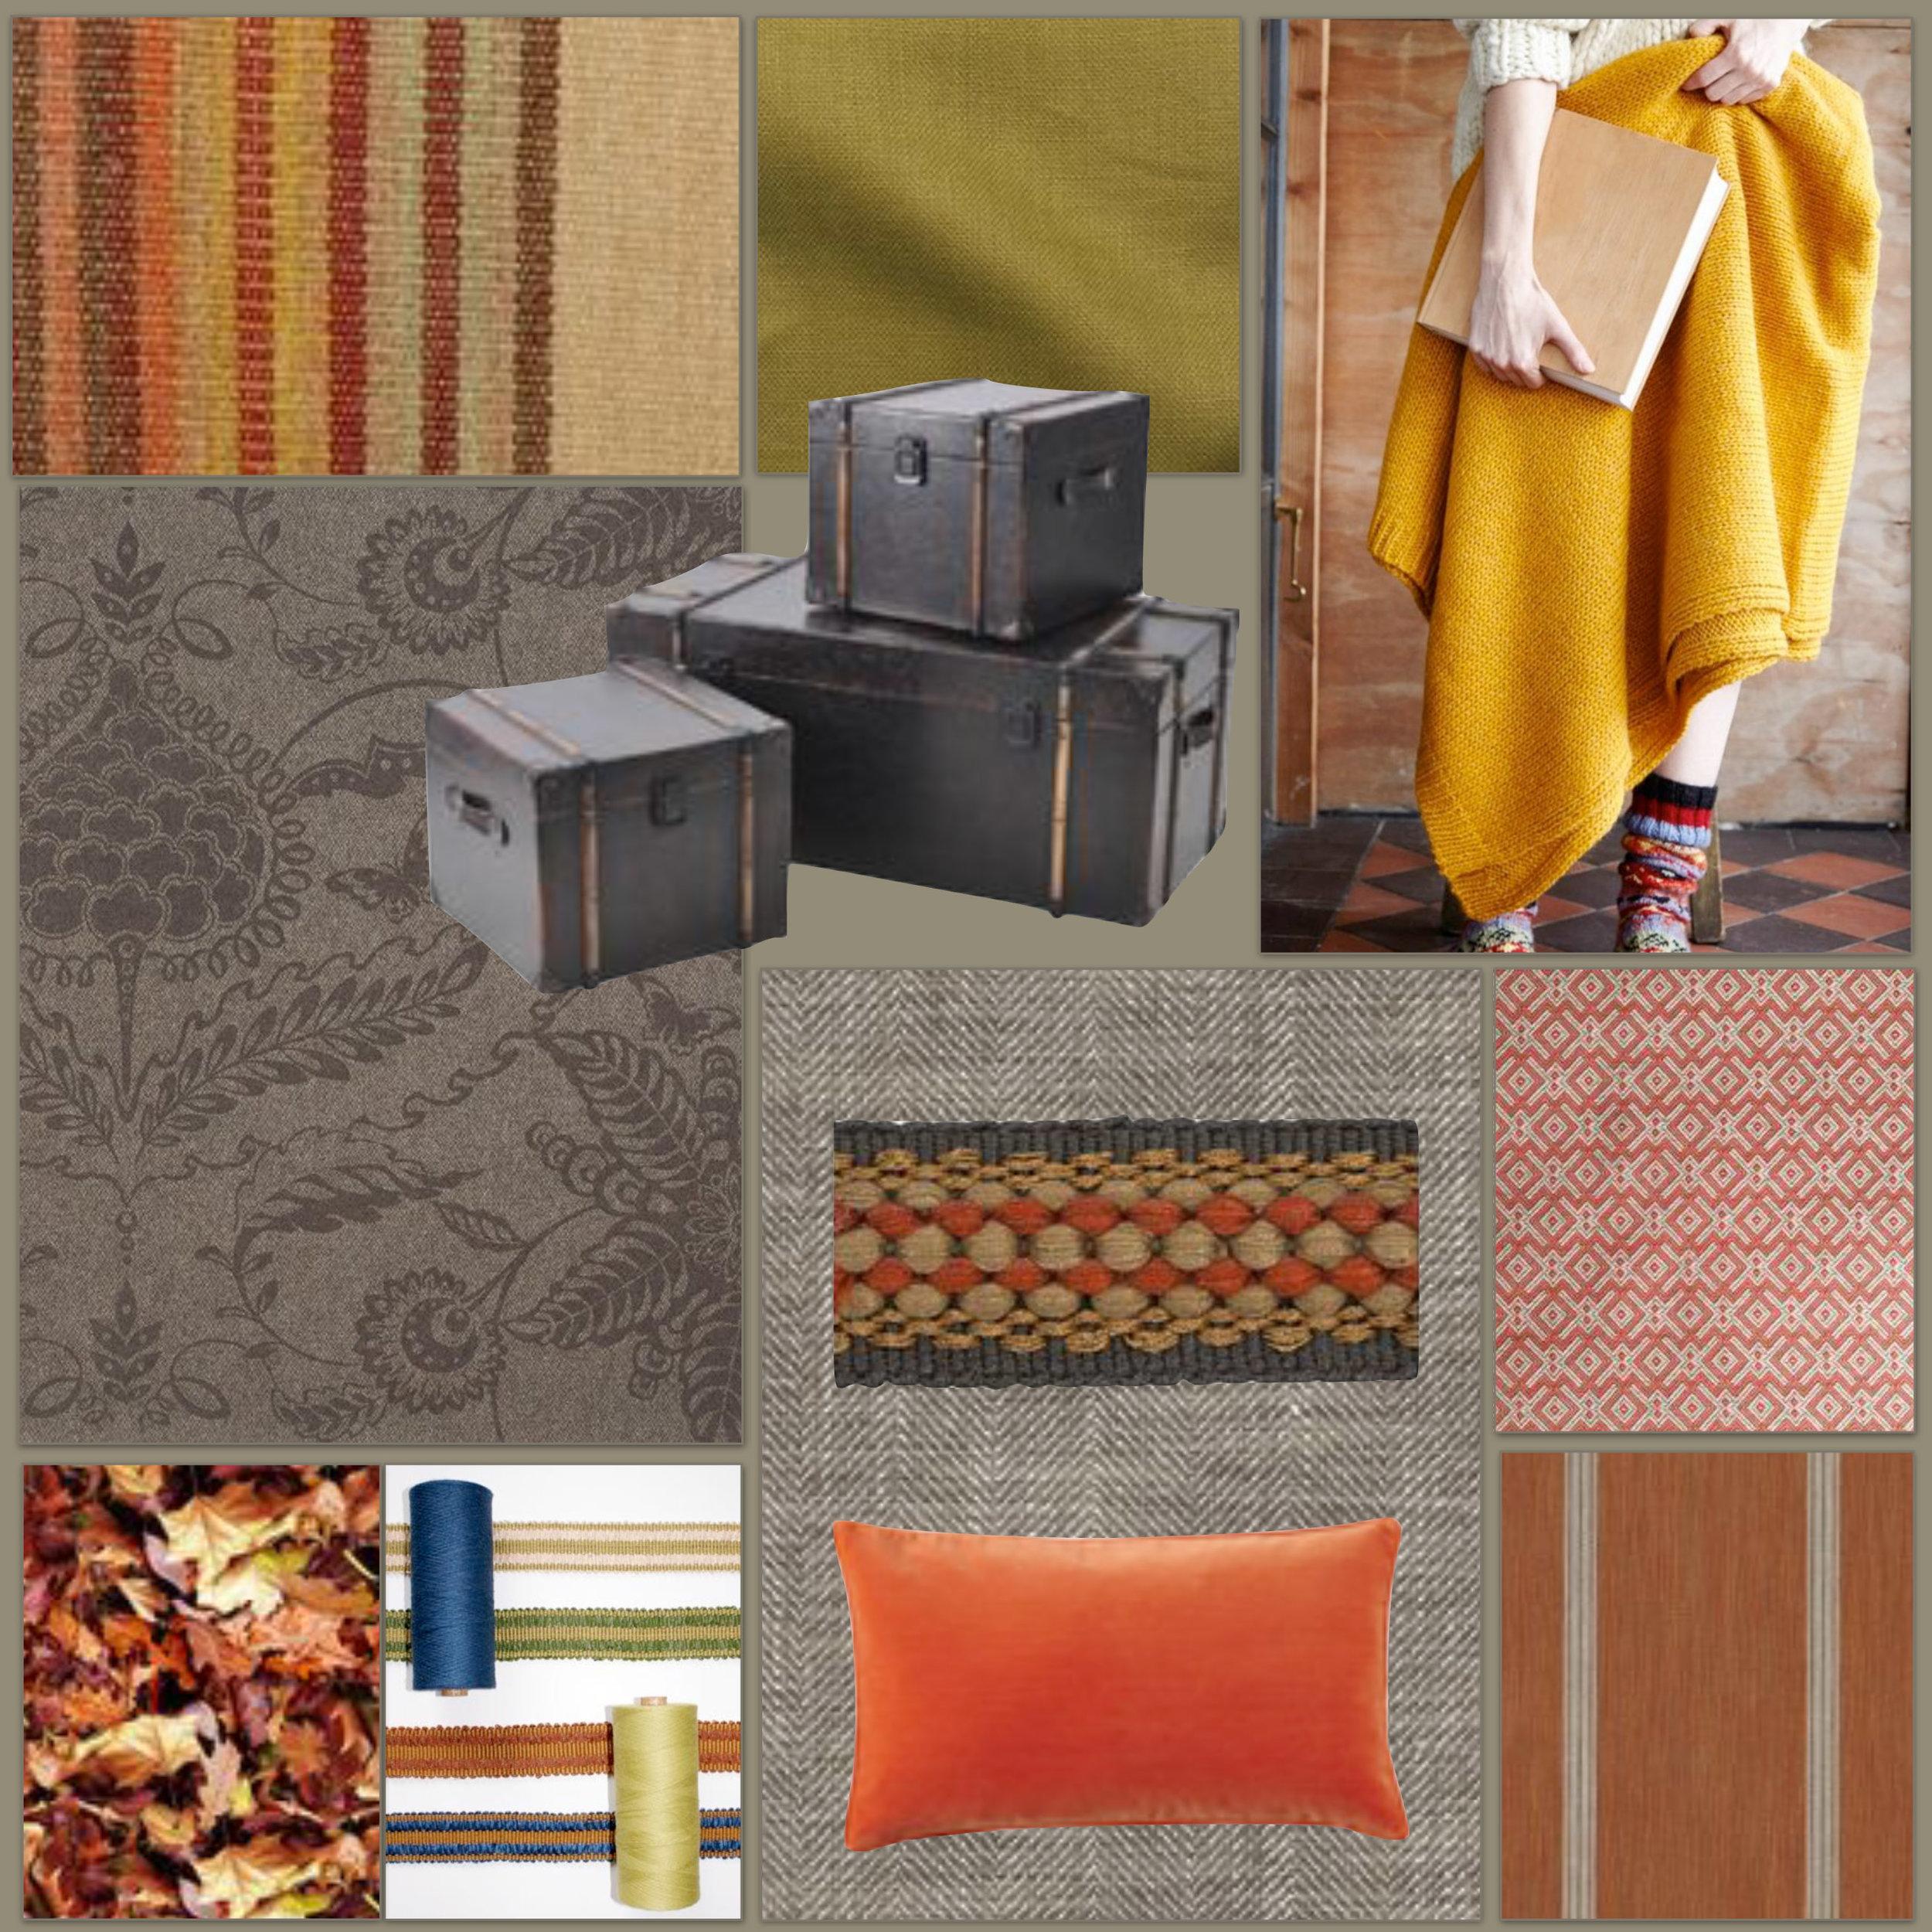 L-R: Twelve Bar Stripe wool / linen mix, Mulberry. Lombardia Linen in Mustard, Spruce London. Knitted Quince Throw, Plümo. Paradise Flower Wool Panel, Rapture & Wright. Brown Faux Leather Storage Trunks, Artisanti. Arran Brown linen mix, Ian Mankin. Festival Braid Denim Trim, Fabrics & Papers. Plain Velvet Cushion Cover, burnt orange, Oka. Amesbury Orange textured fabric, Blithfield. Moro Mango, Romo.